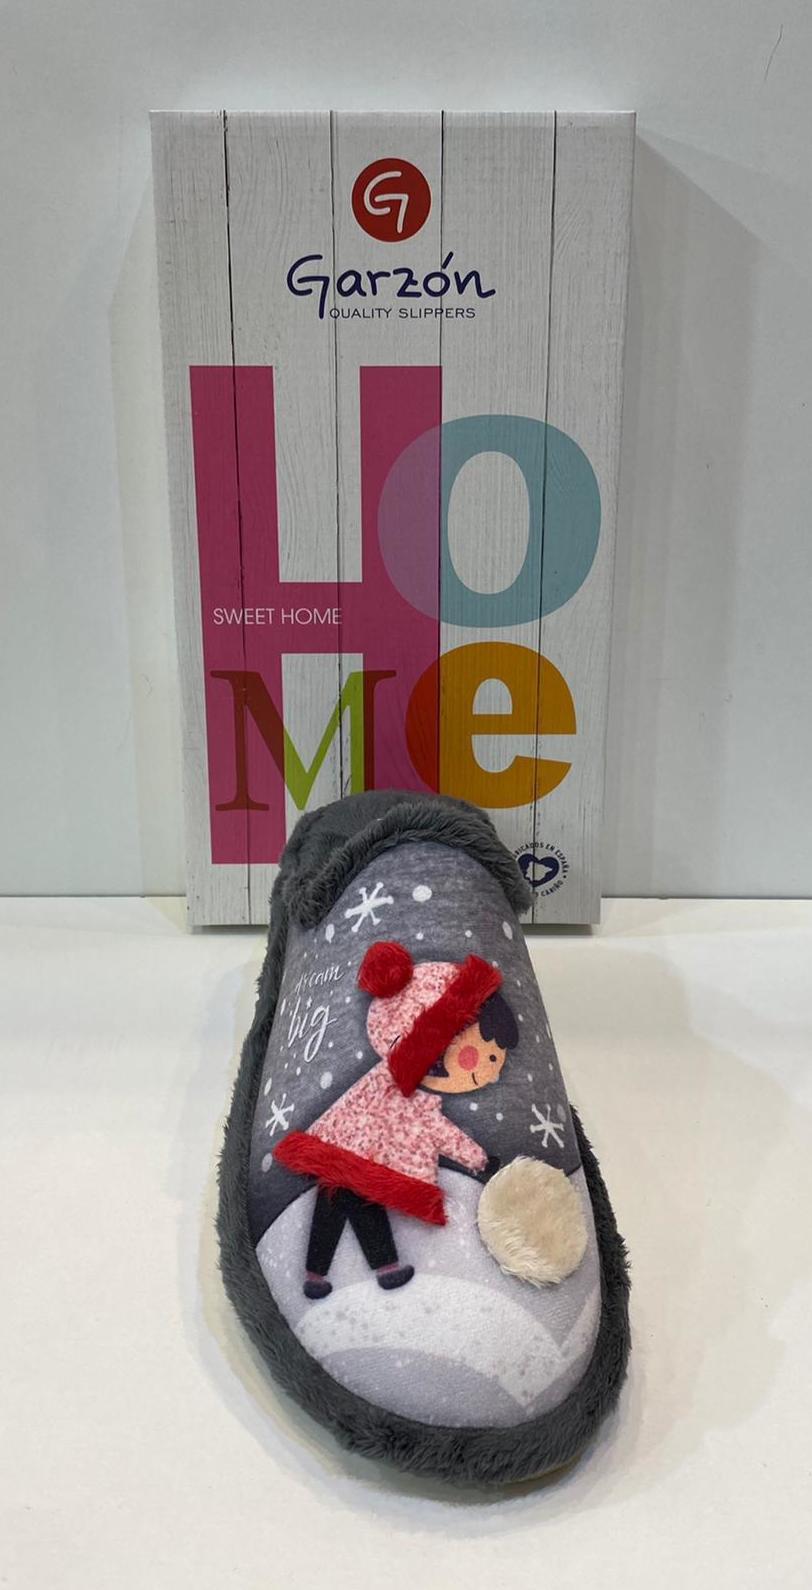 Espardenya de dona, de la marca Garzón, amb sola de microporós especial parquet 31€